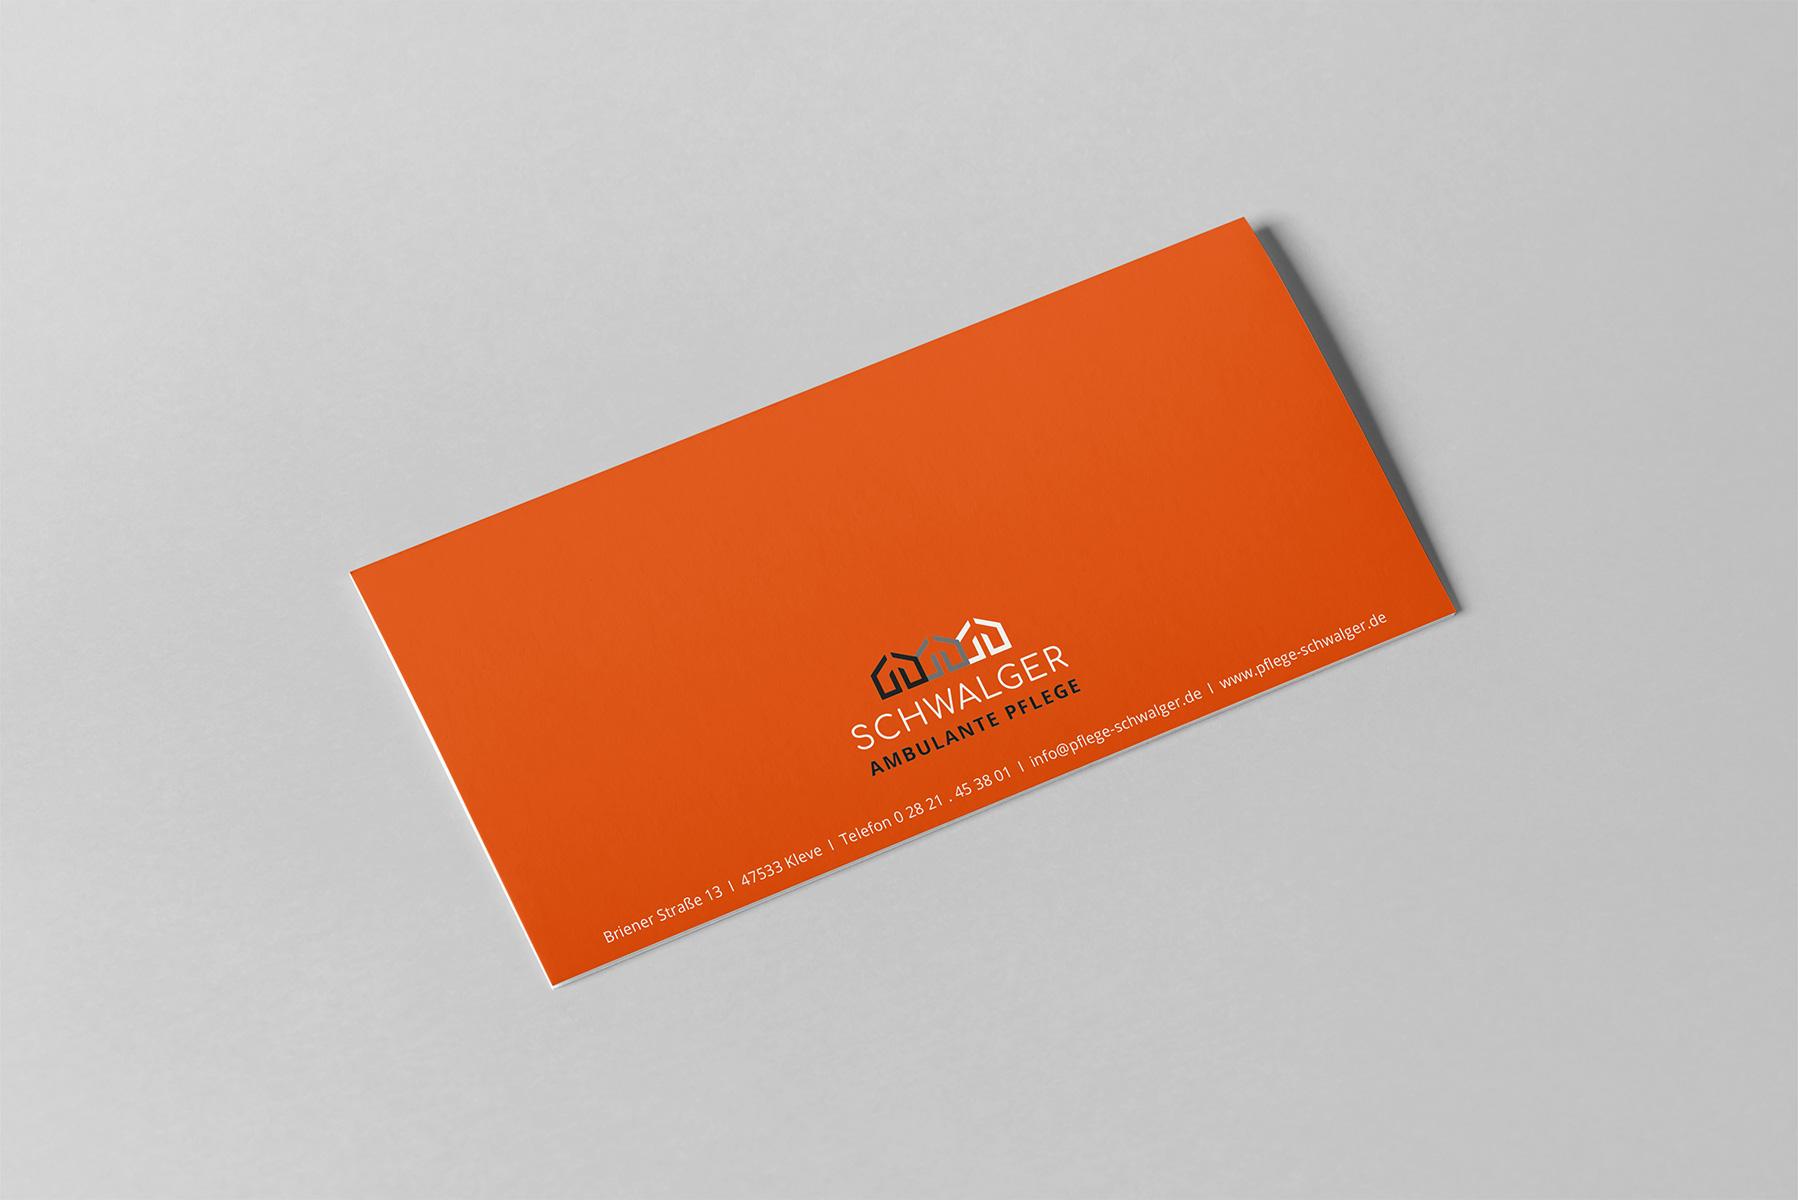 schwalger-karte-03